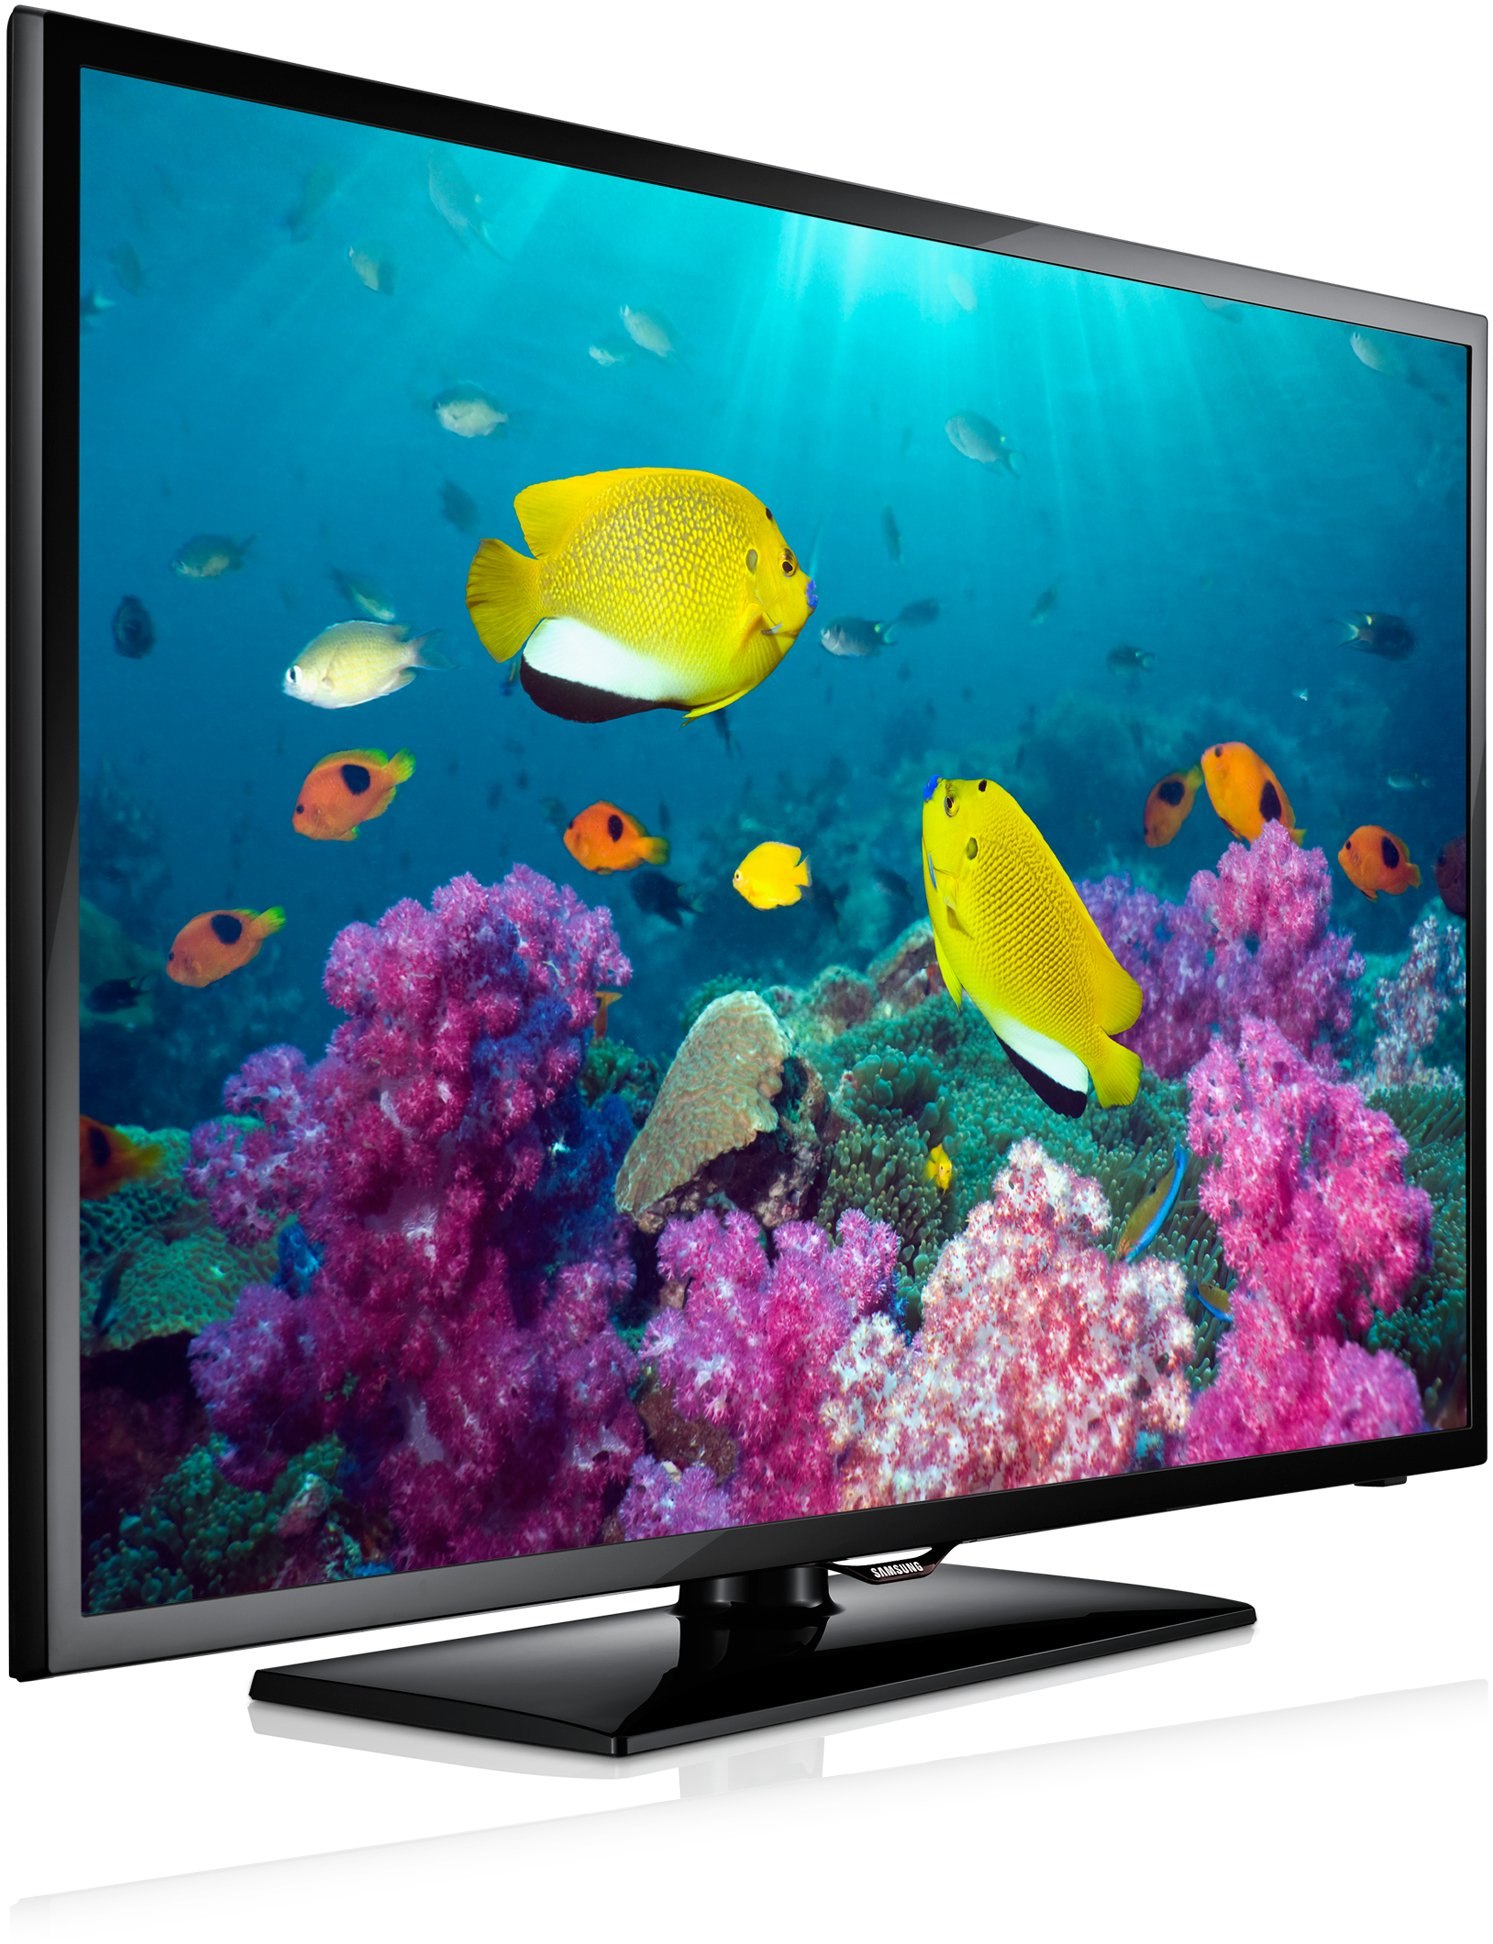 Samsung UE32F5070 - Televisión con retroiluminación LED (80 cm, 32